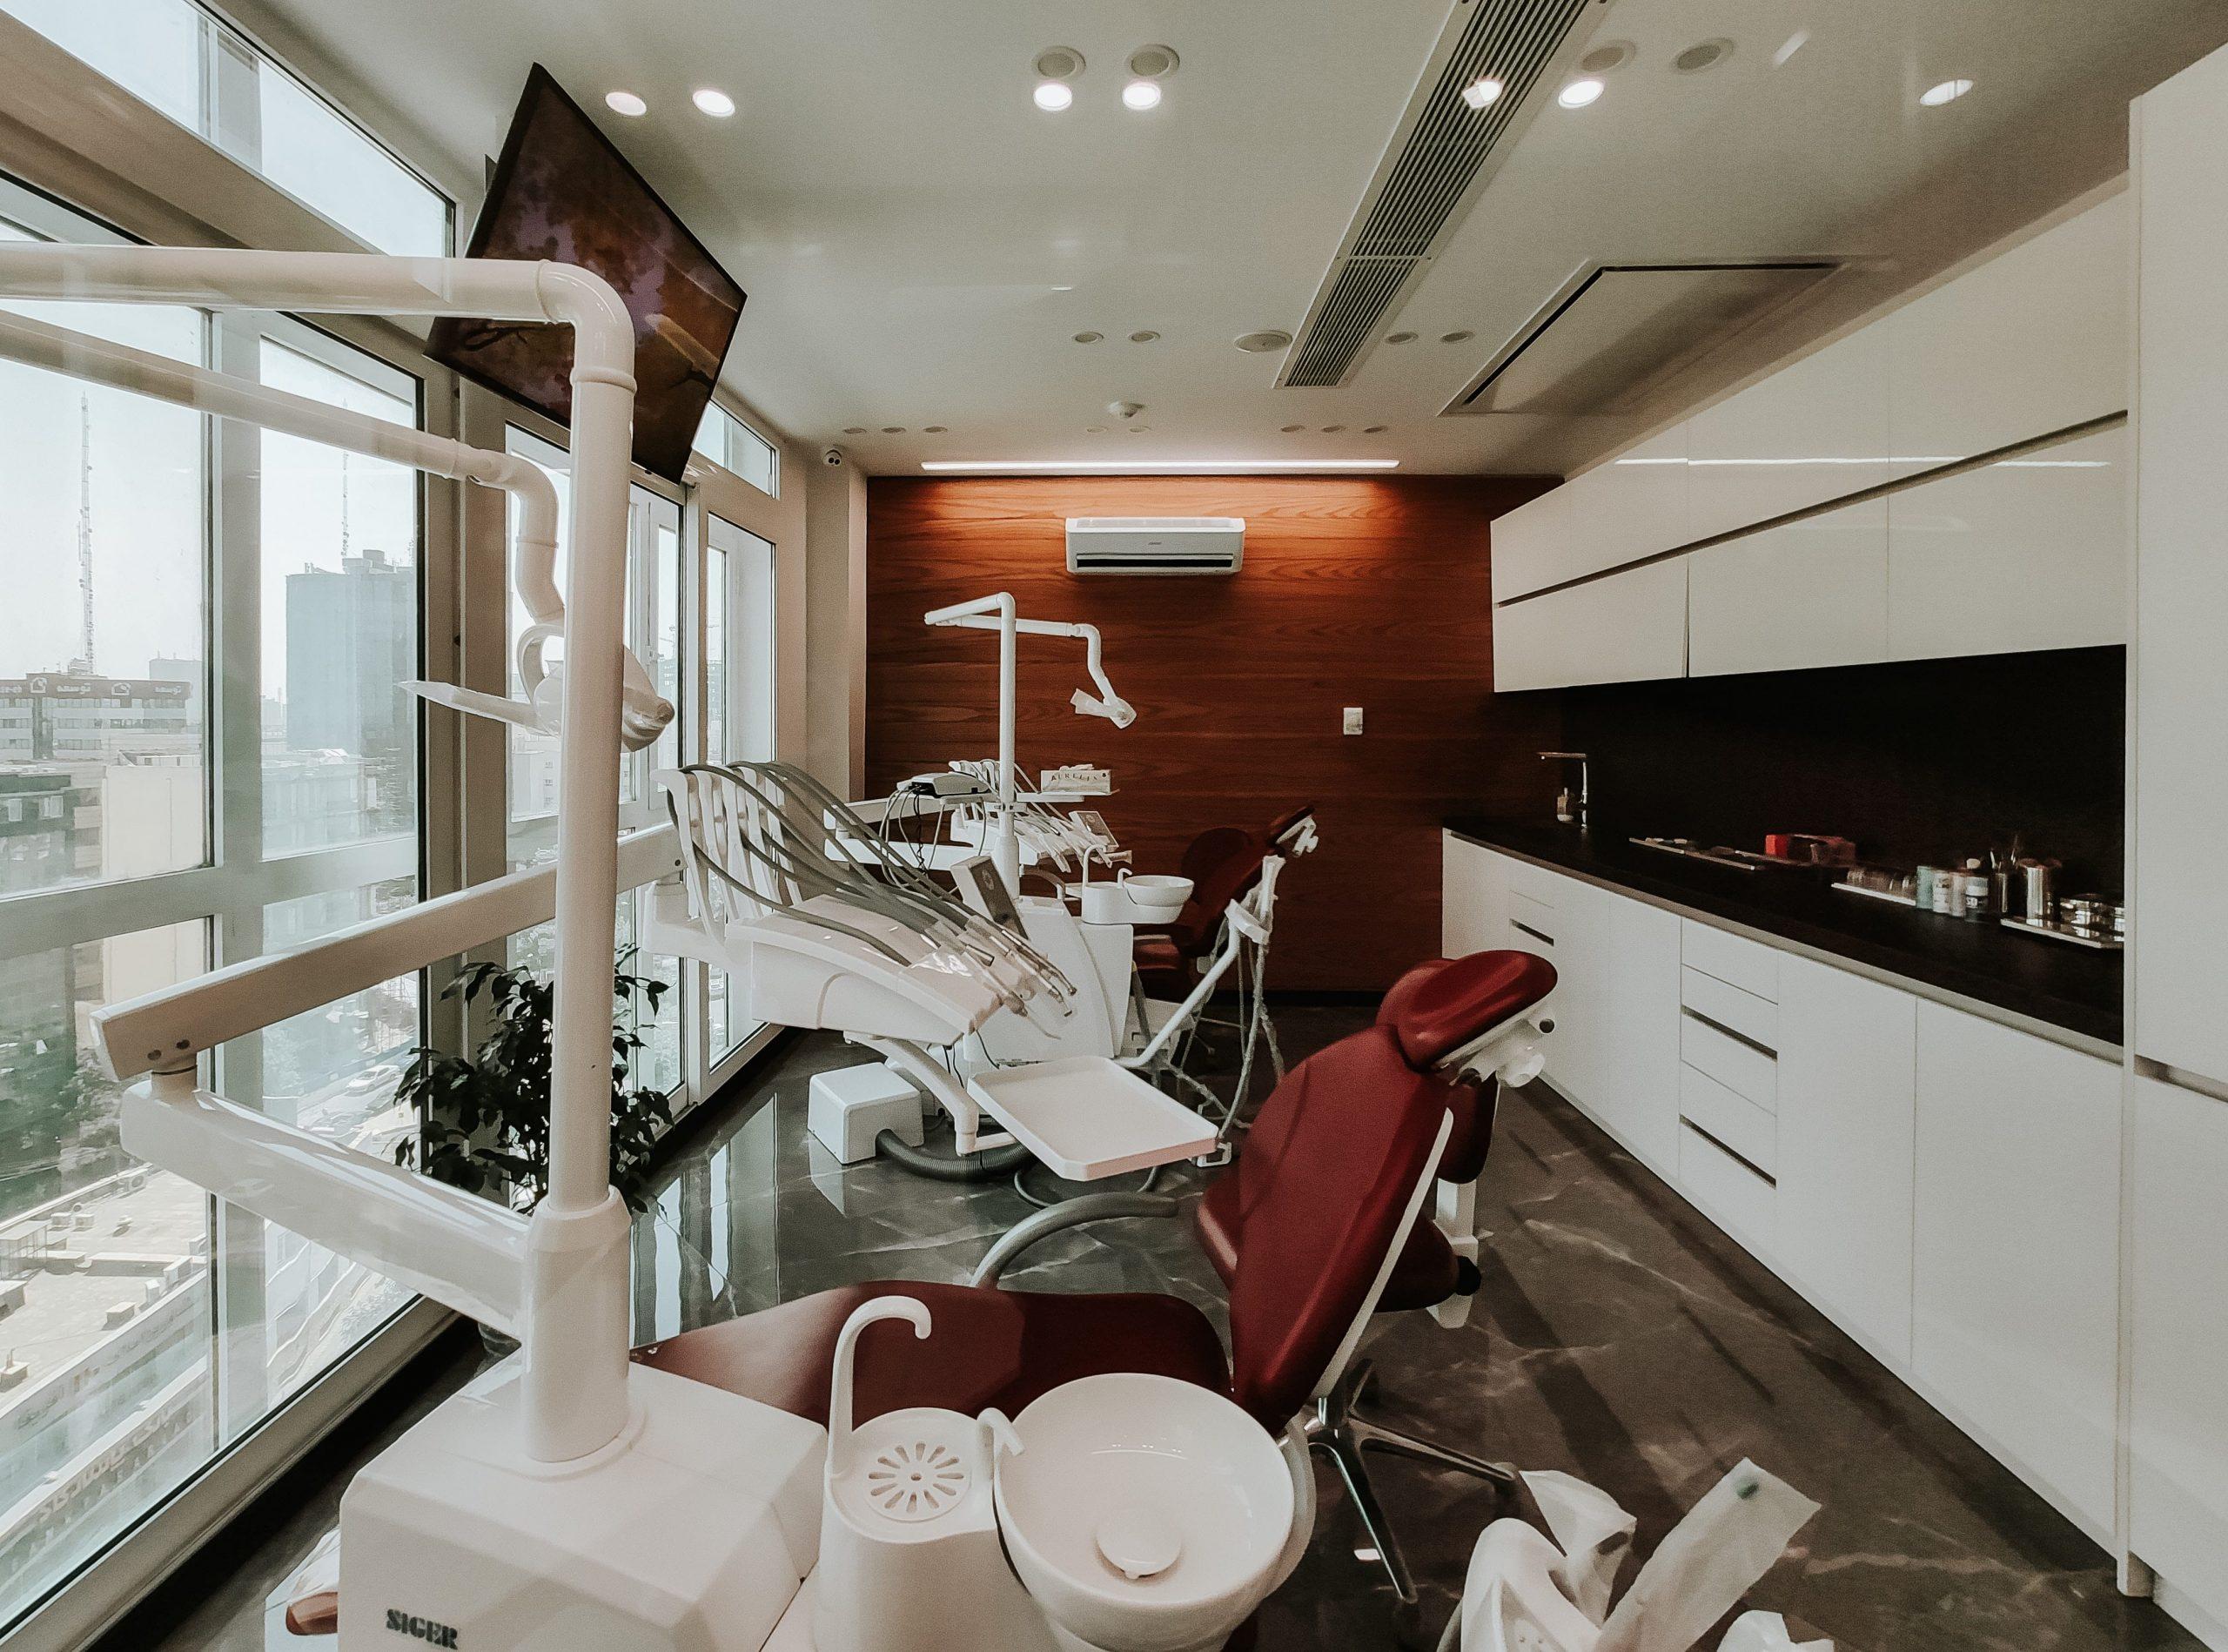 Top Dental Schools In The World